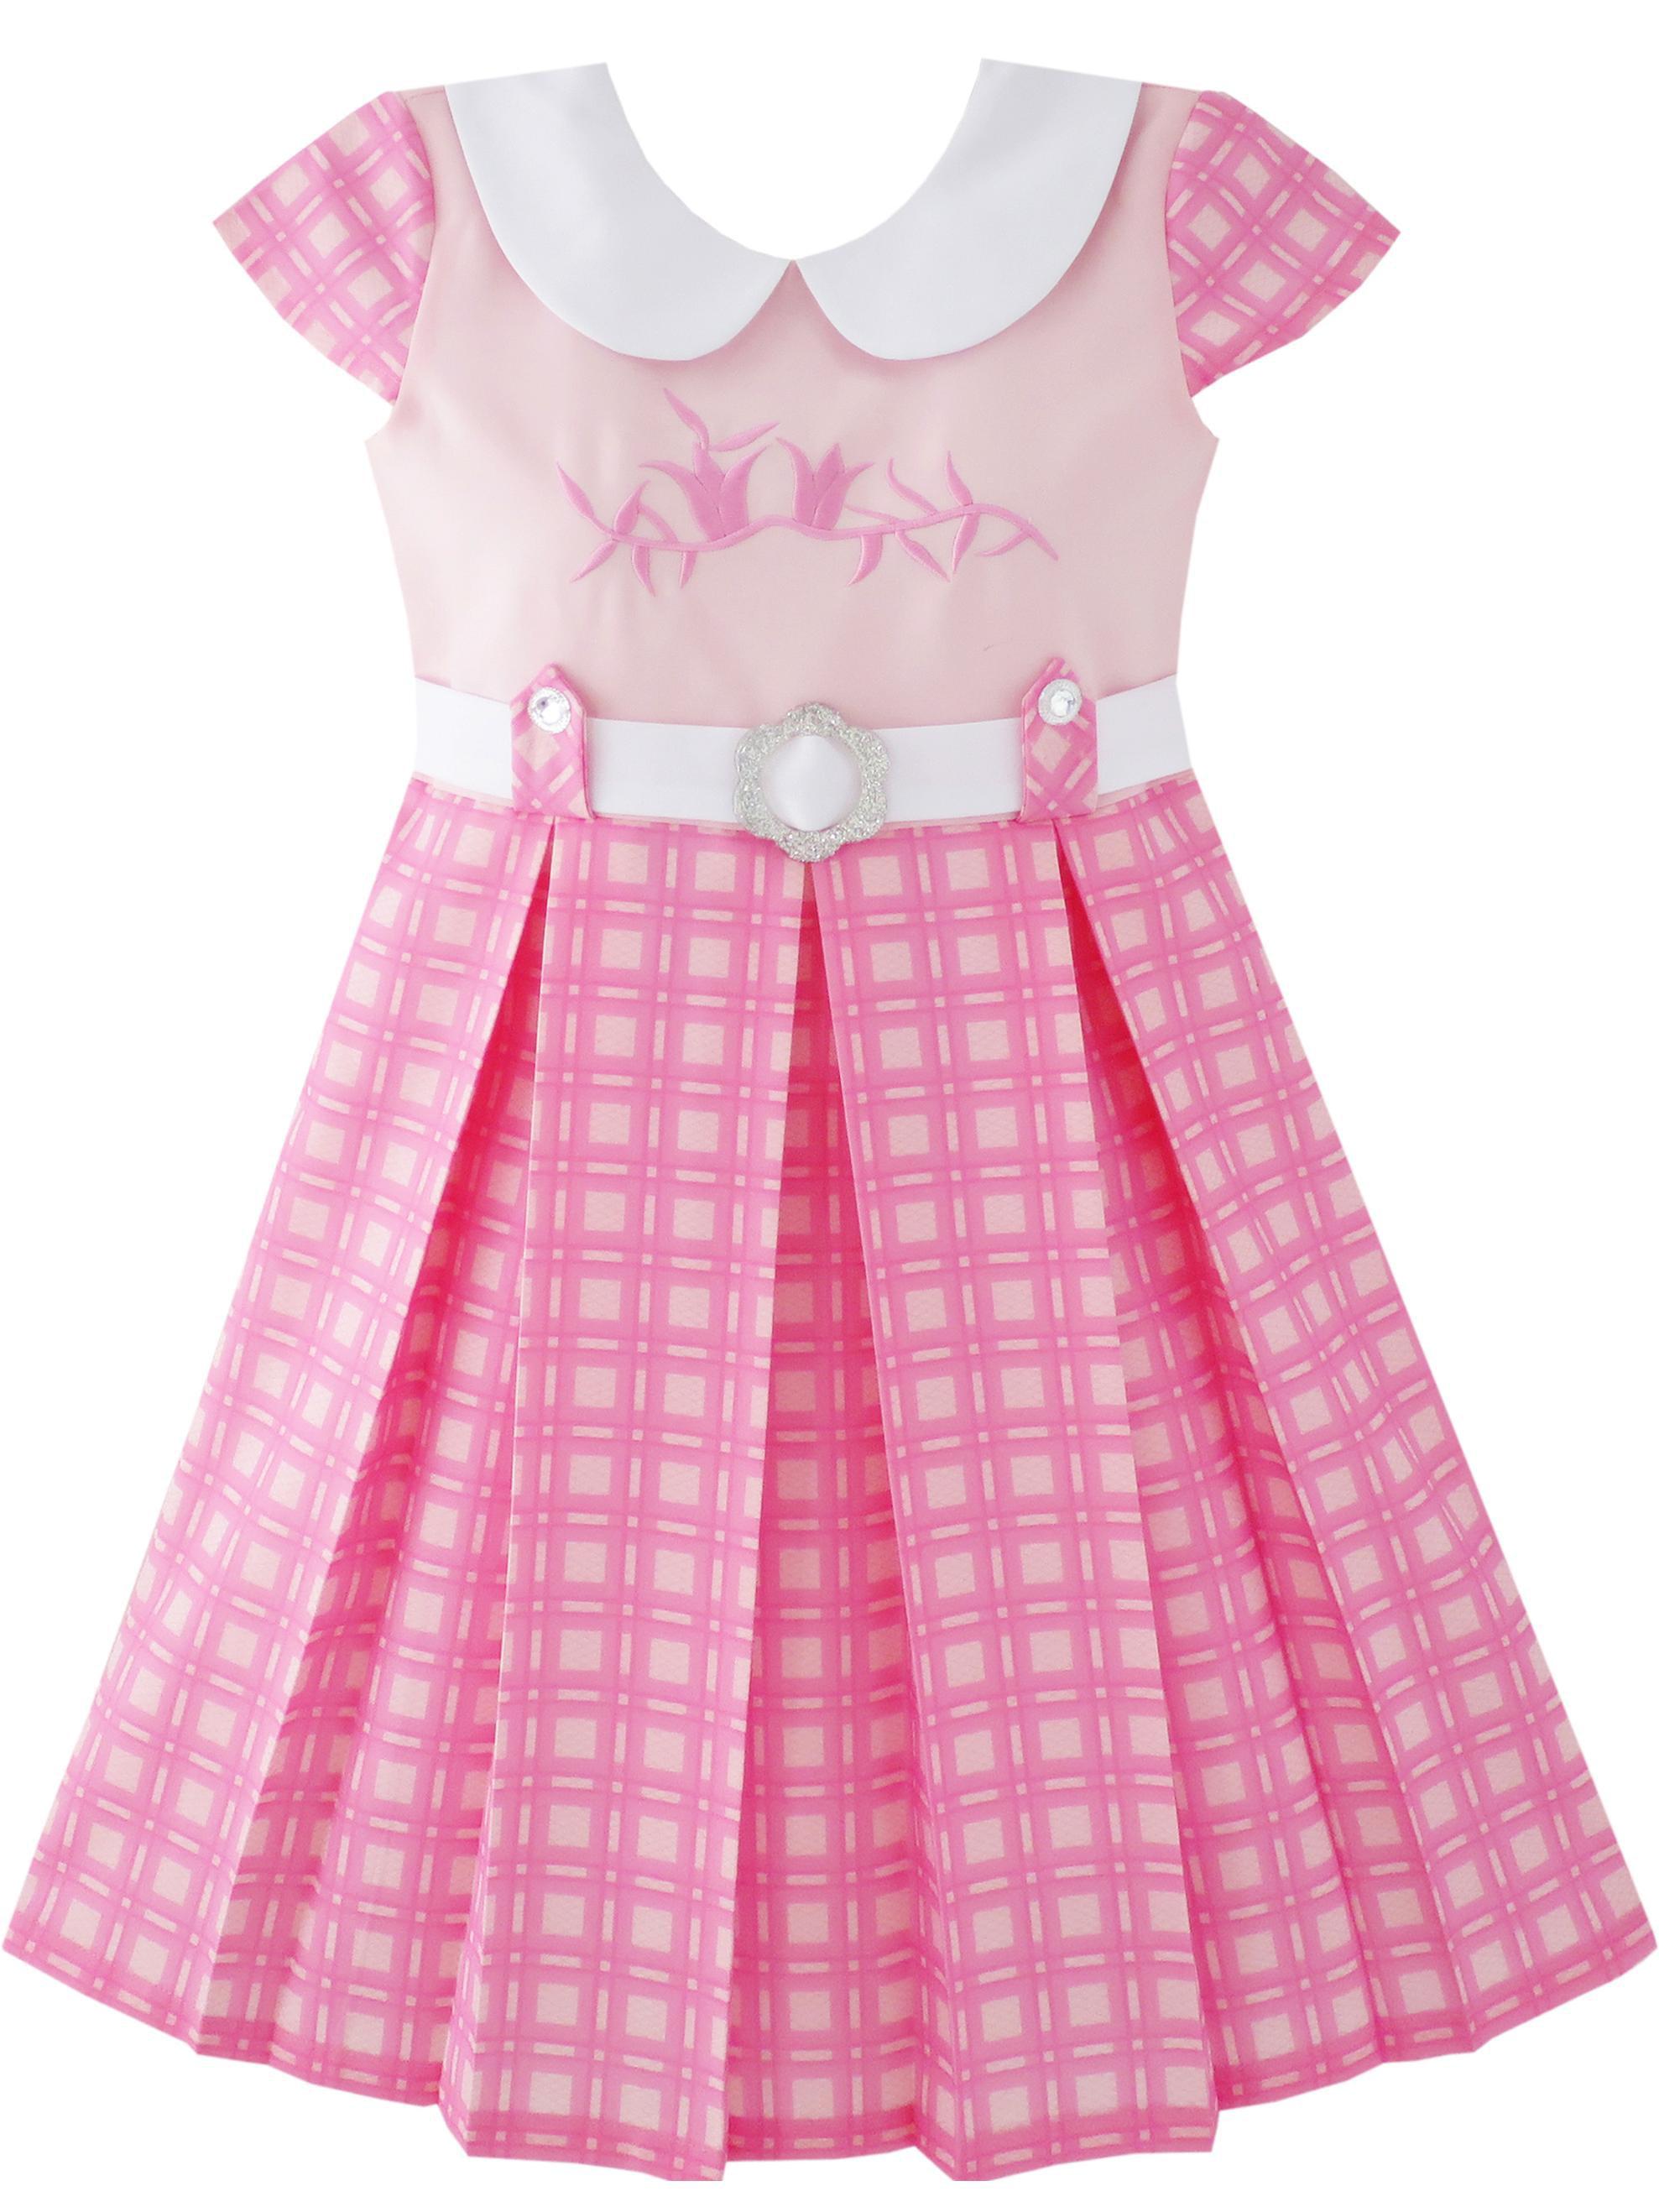 Girls Dress Pink Belted School Uniform Pleated Hem 4